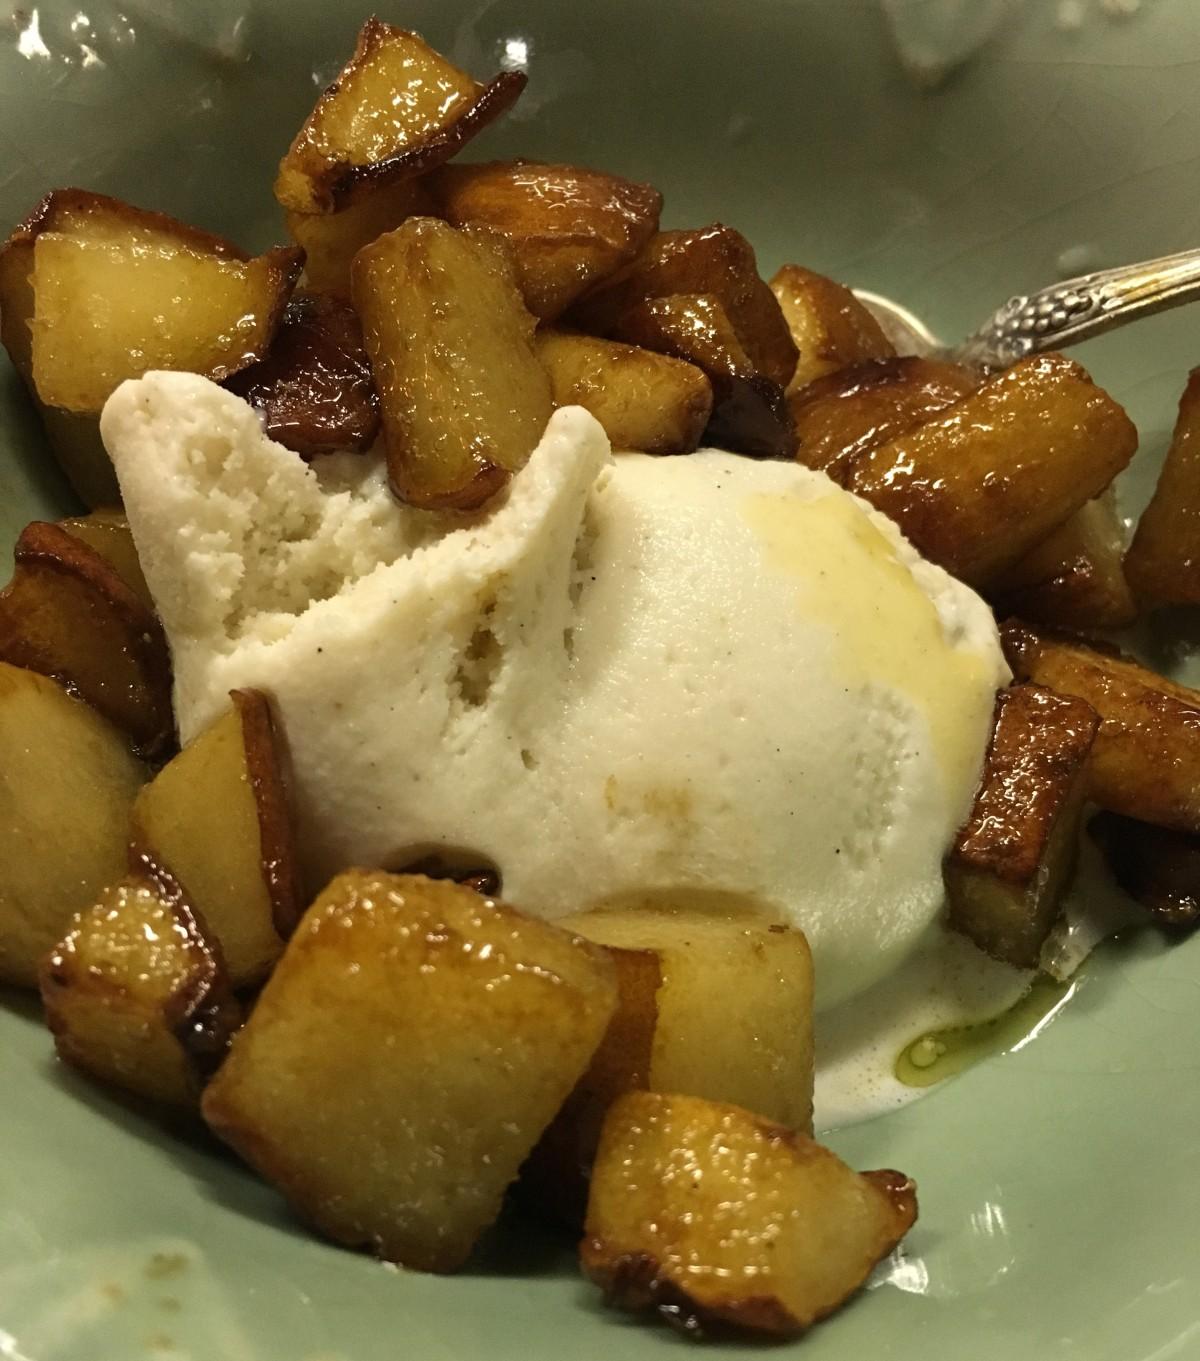 Caramelized Bosc pears with vanilla gelato.